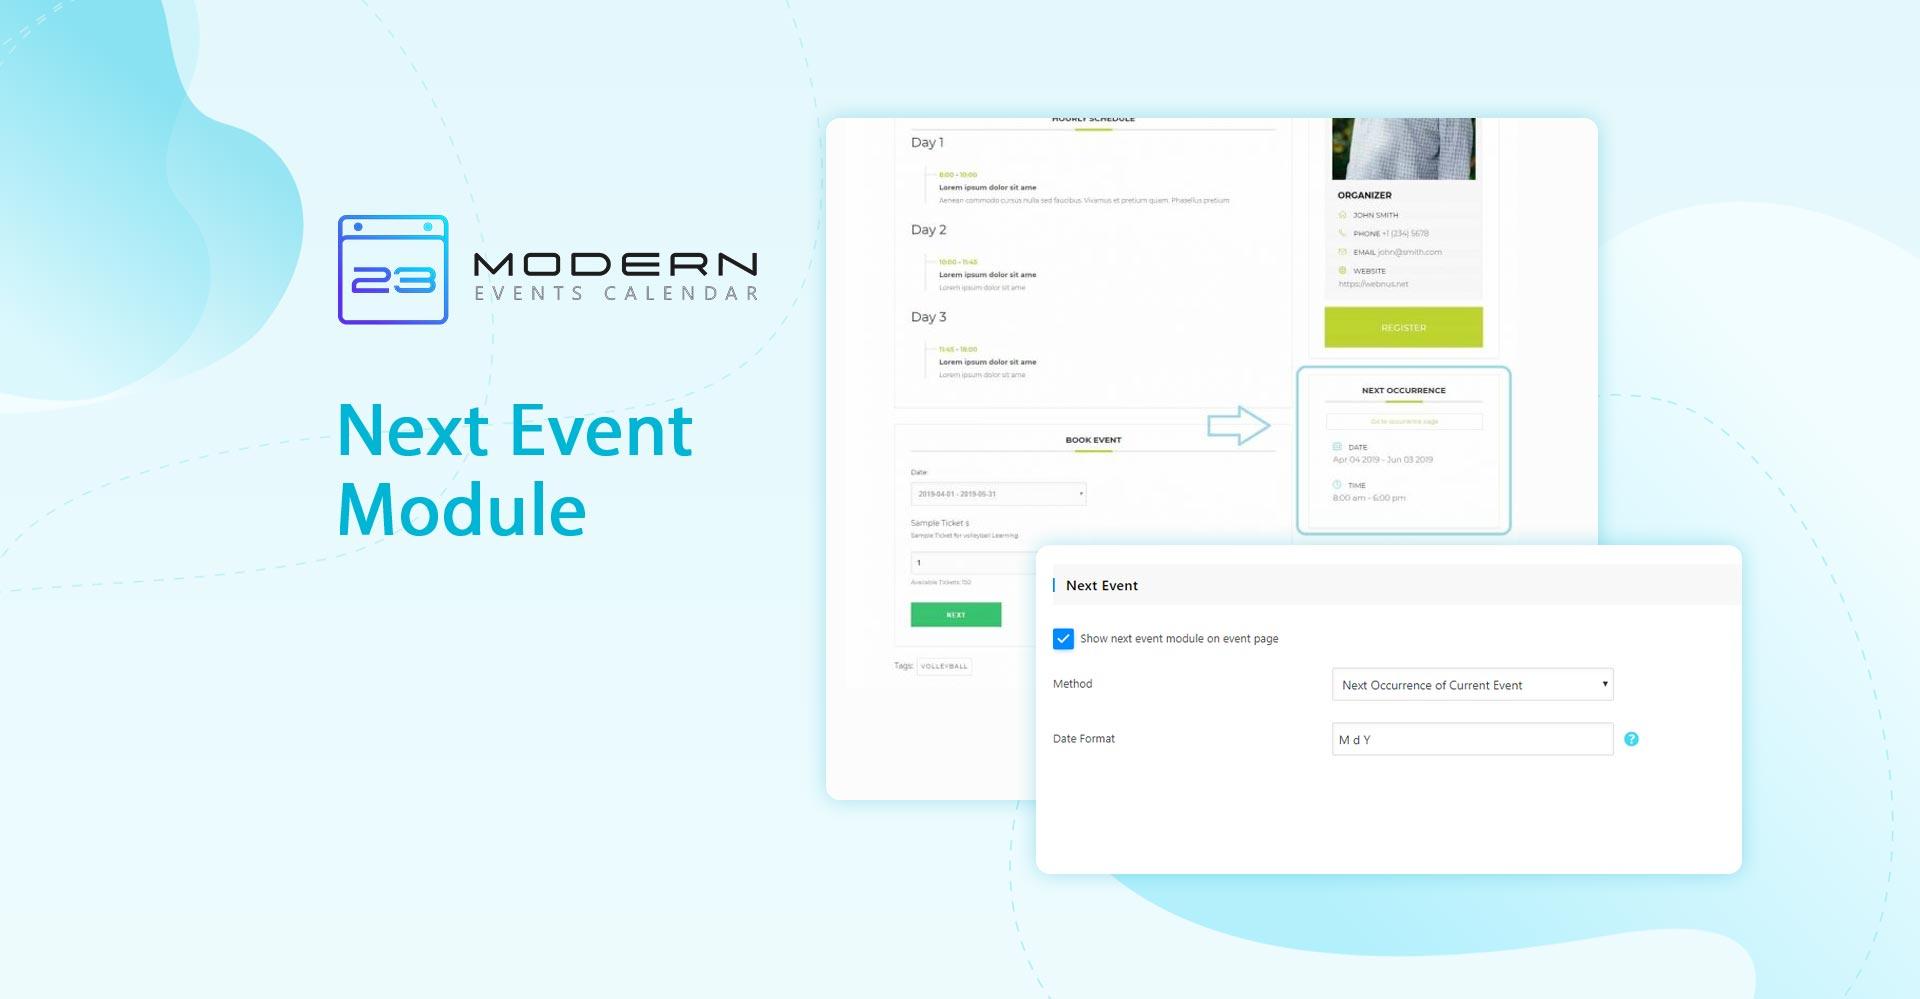 Next Event Module in Modern event calendar